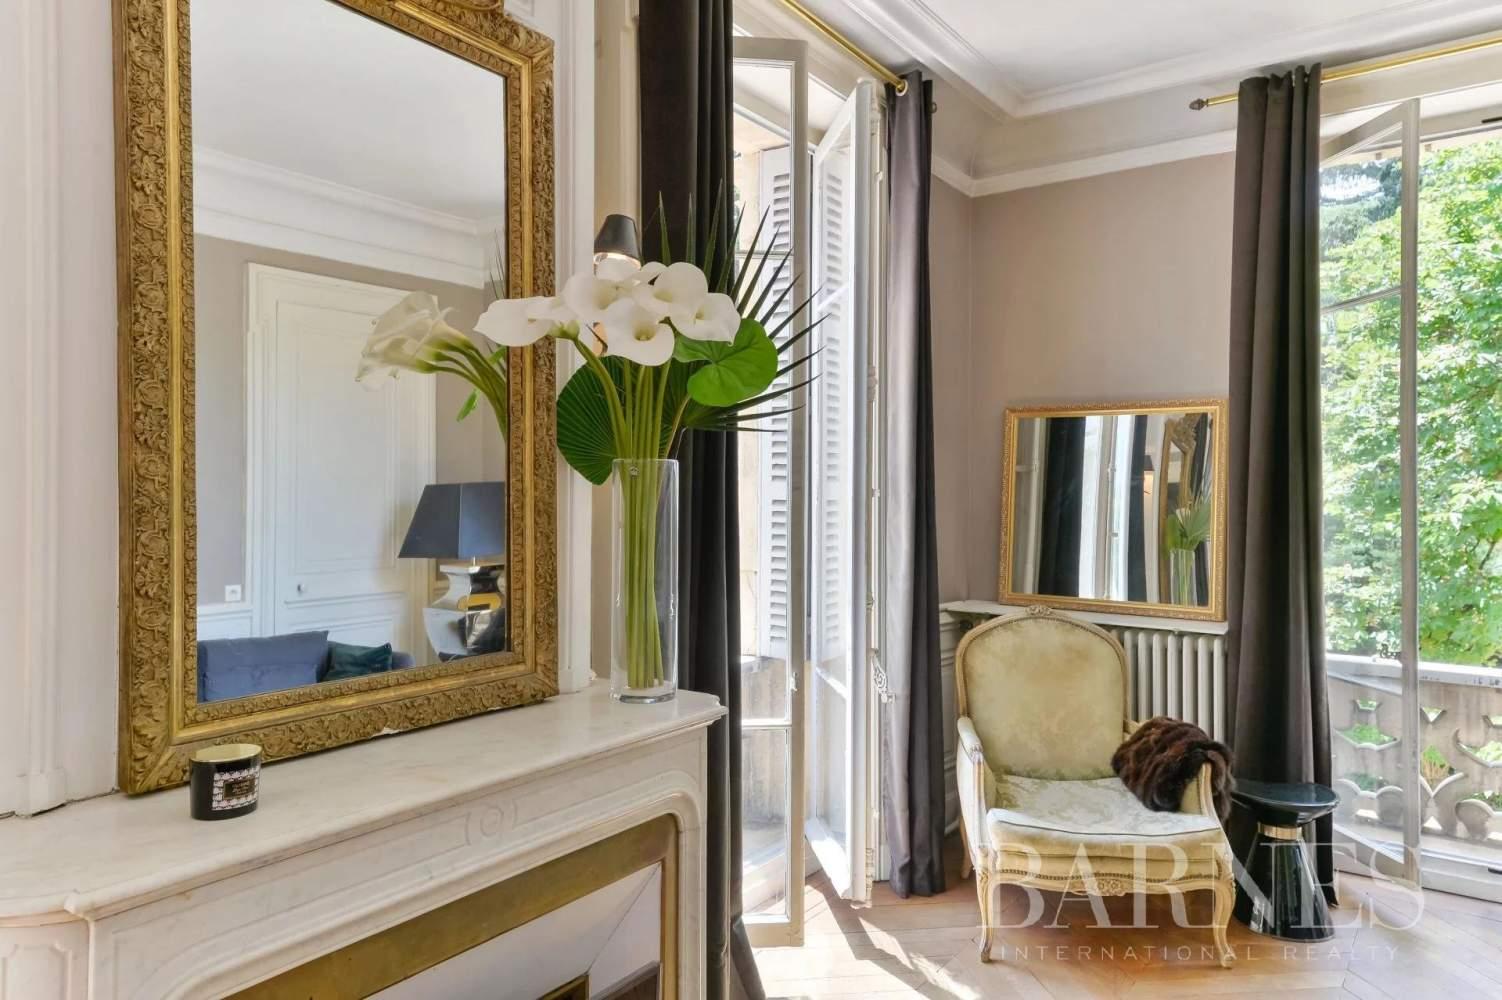 Écully  - Appartement 4 Pièces 3 Chambres - picture 8